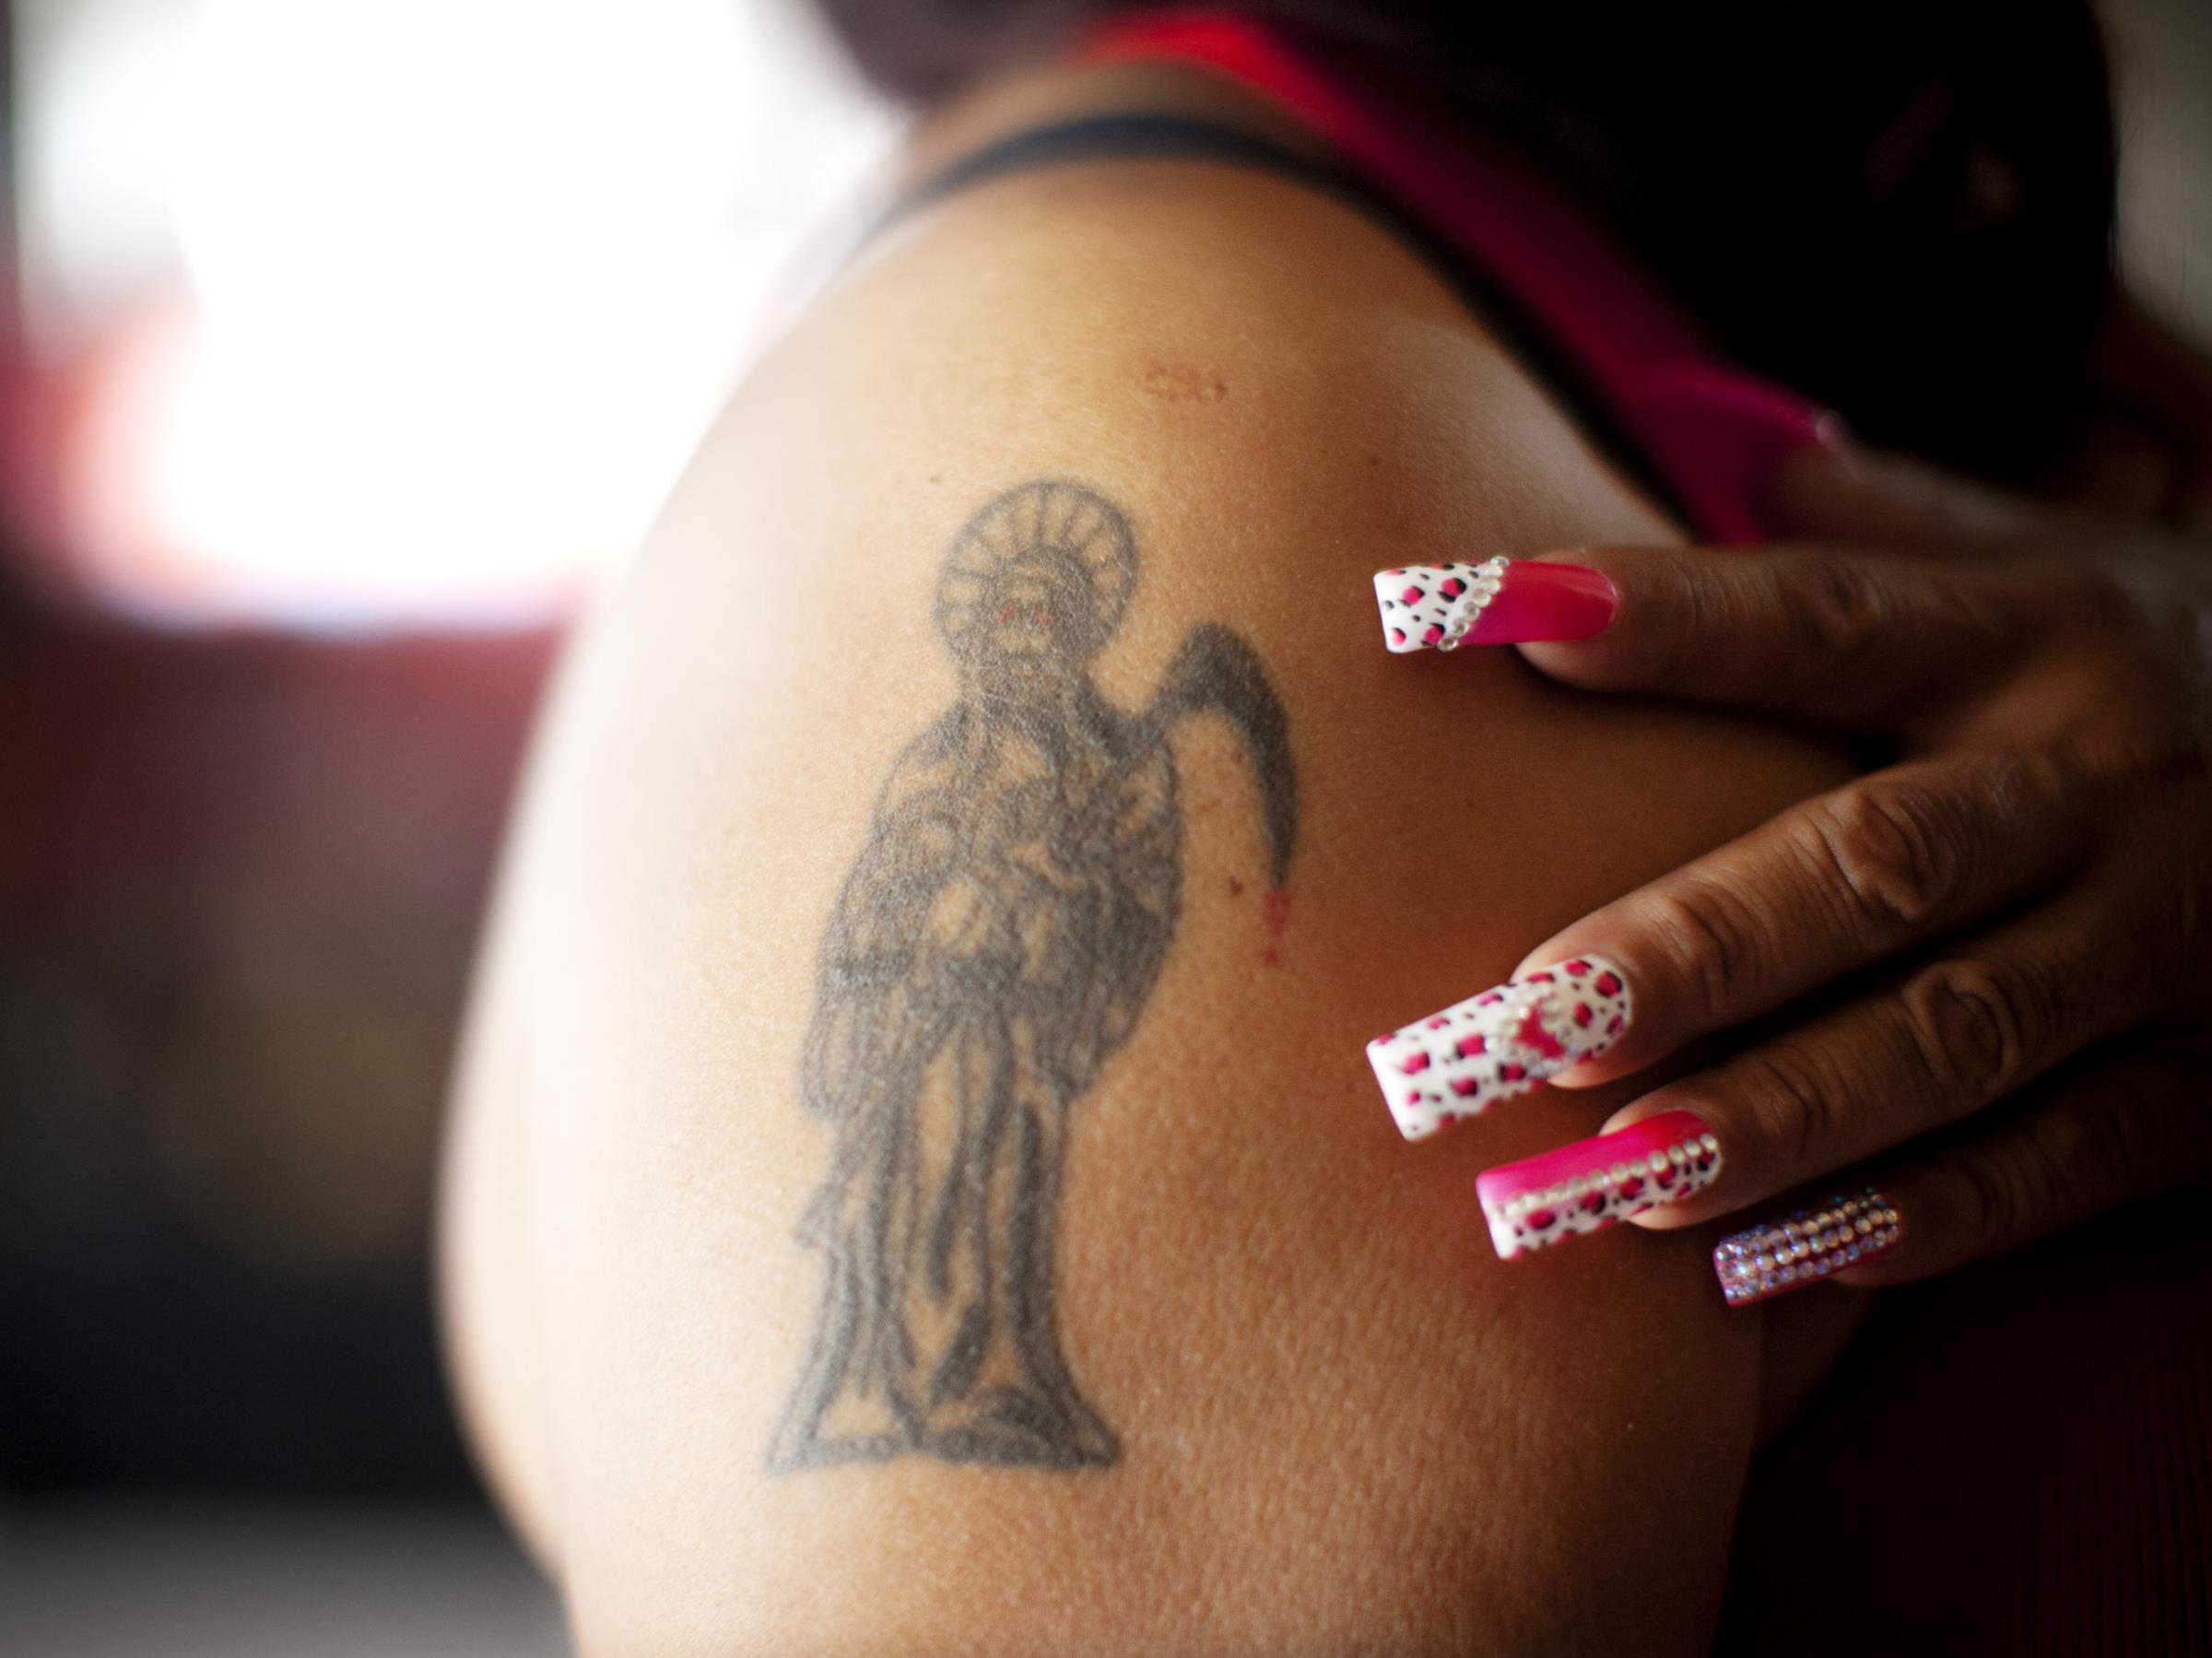 Cartel De Santa Tattoos View slideshow